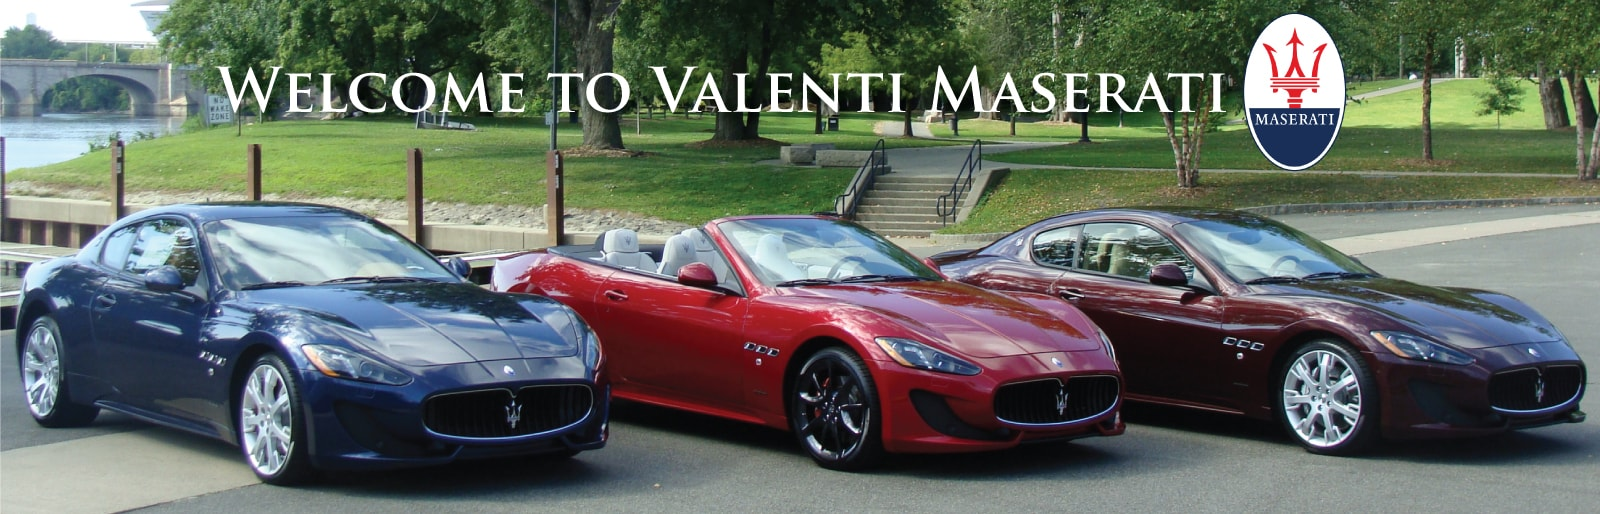 valenti maserati new maserati dealership in hartford ct 06120. Black Bedroom Furniture Sets. Home Design Ideas